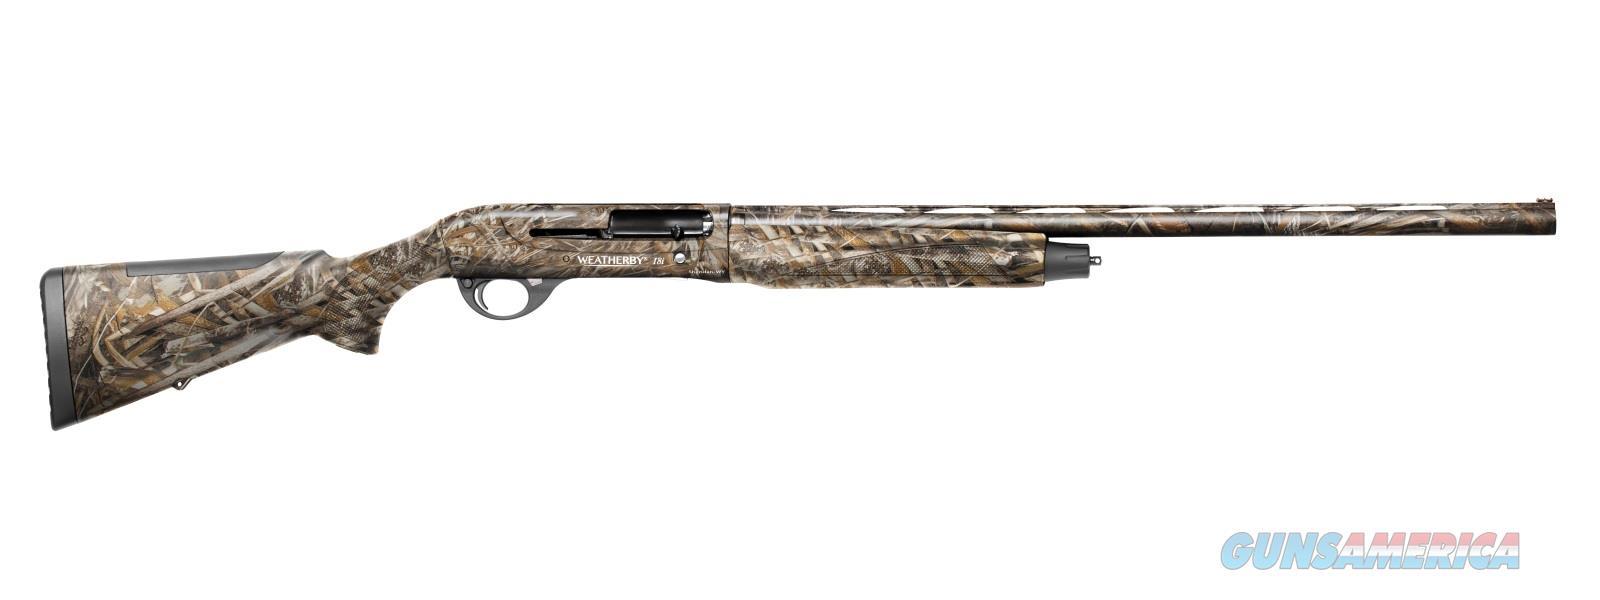 "Weatherby 18i Waterfowler 12 GA 28"" Realtree Max-5 IWR1228SMG   Guns > Shotguns > Weatherby Shotguns > Hunting > Autoloader"